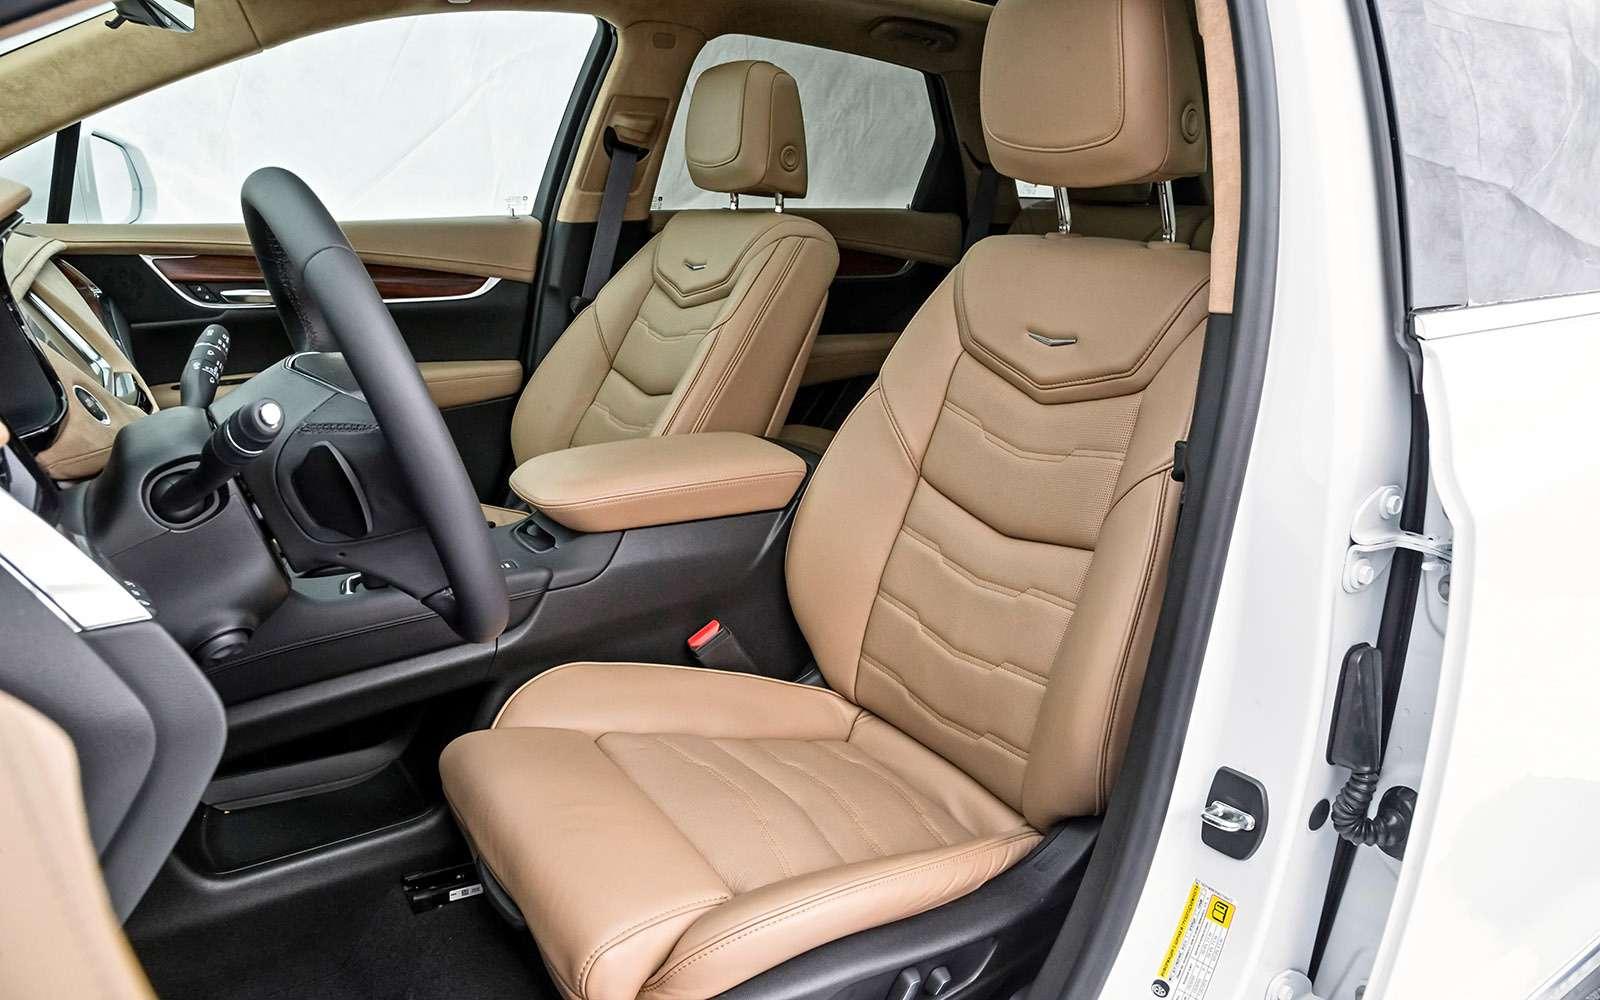 Тест премиум-кроссоверов: Lexus RX350, Cadillac XT5и Jaguar F-Pace— фото 721801